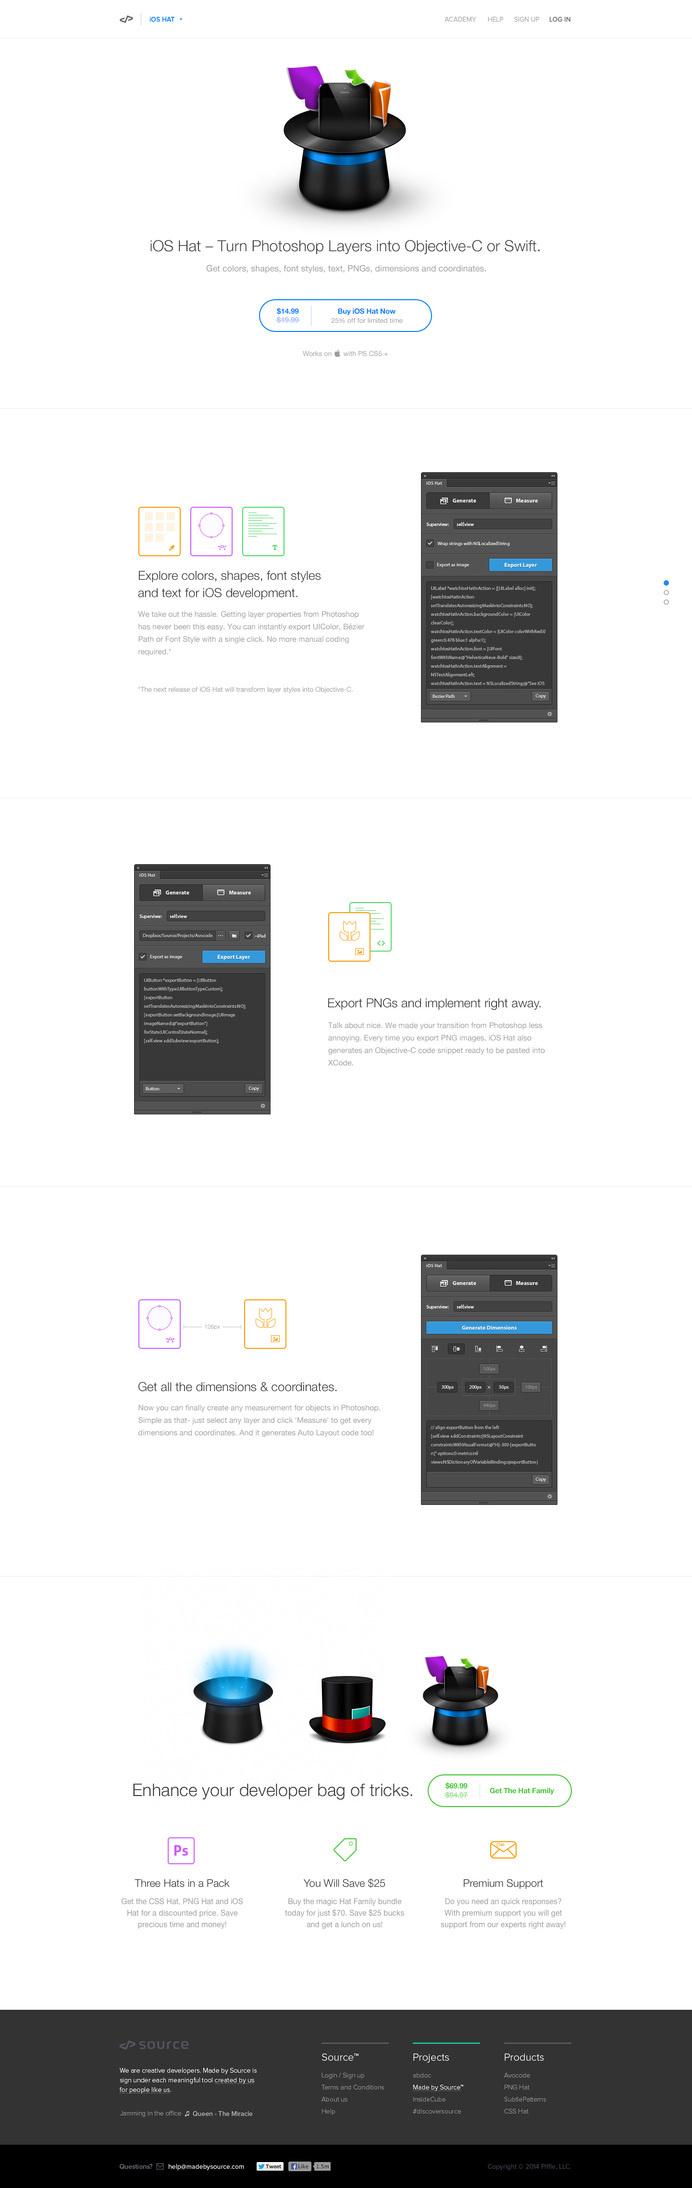 iOS Hat Landing page by David Stefanides #page #site #design #product #web #landing